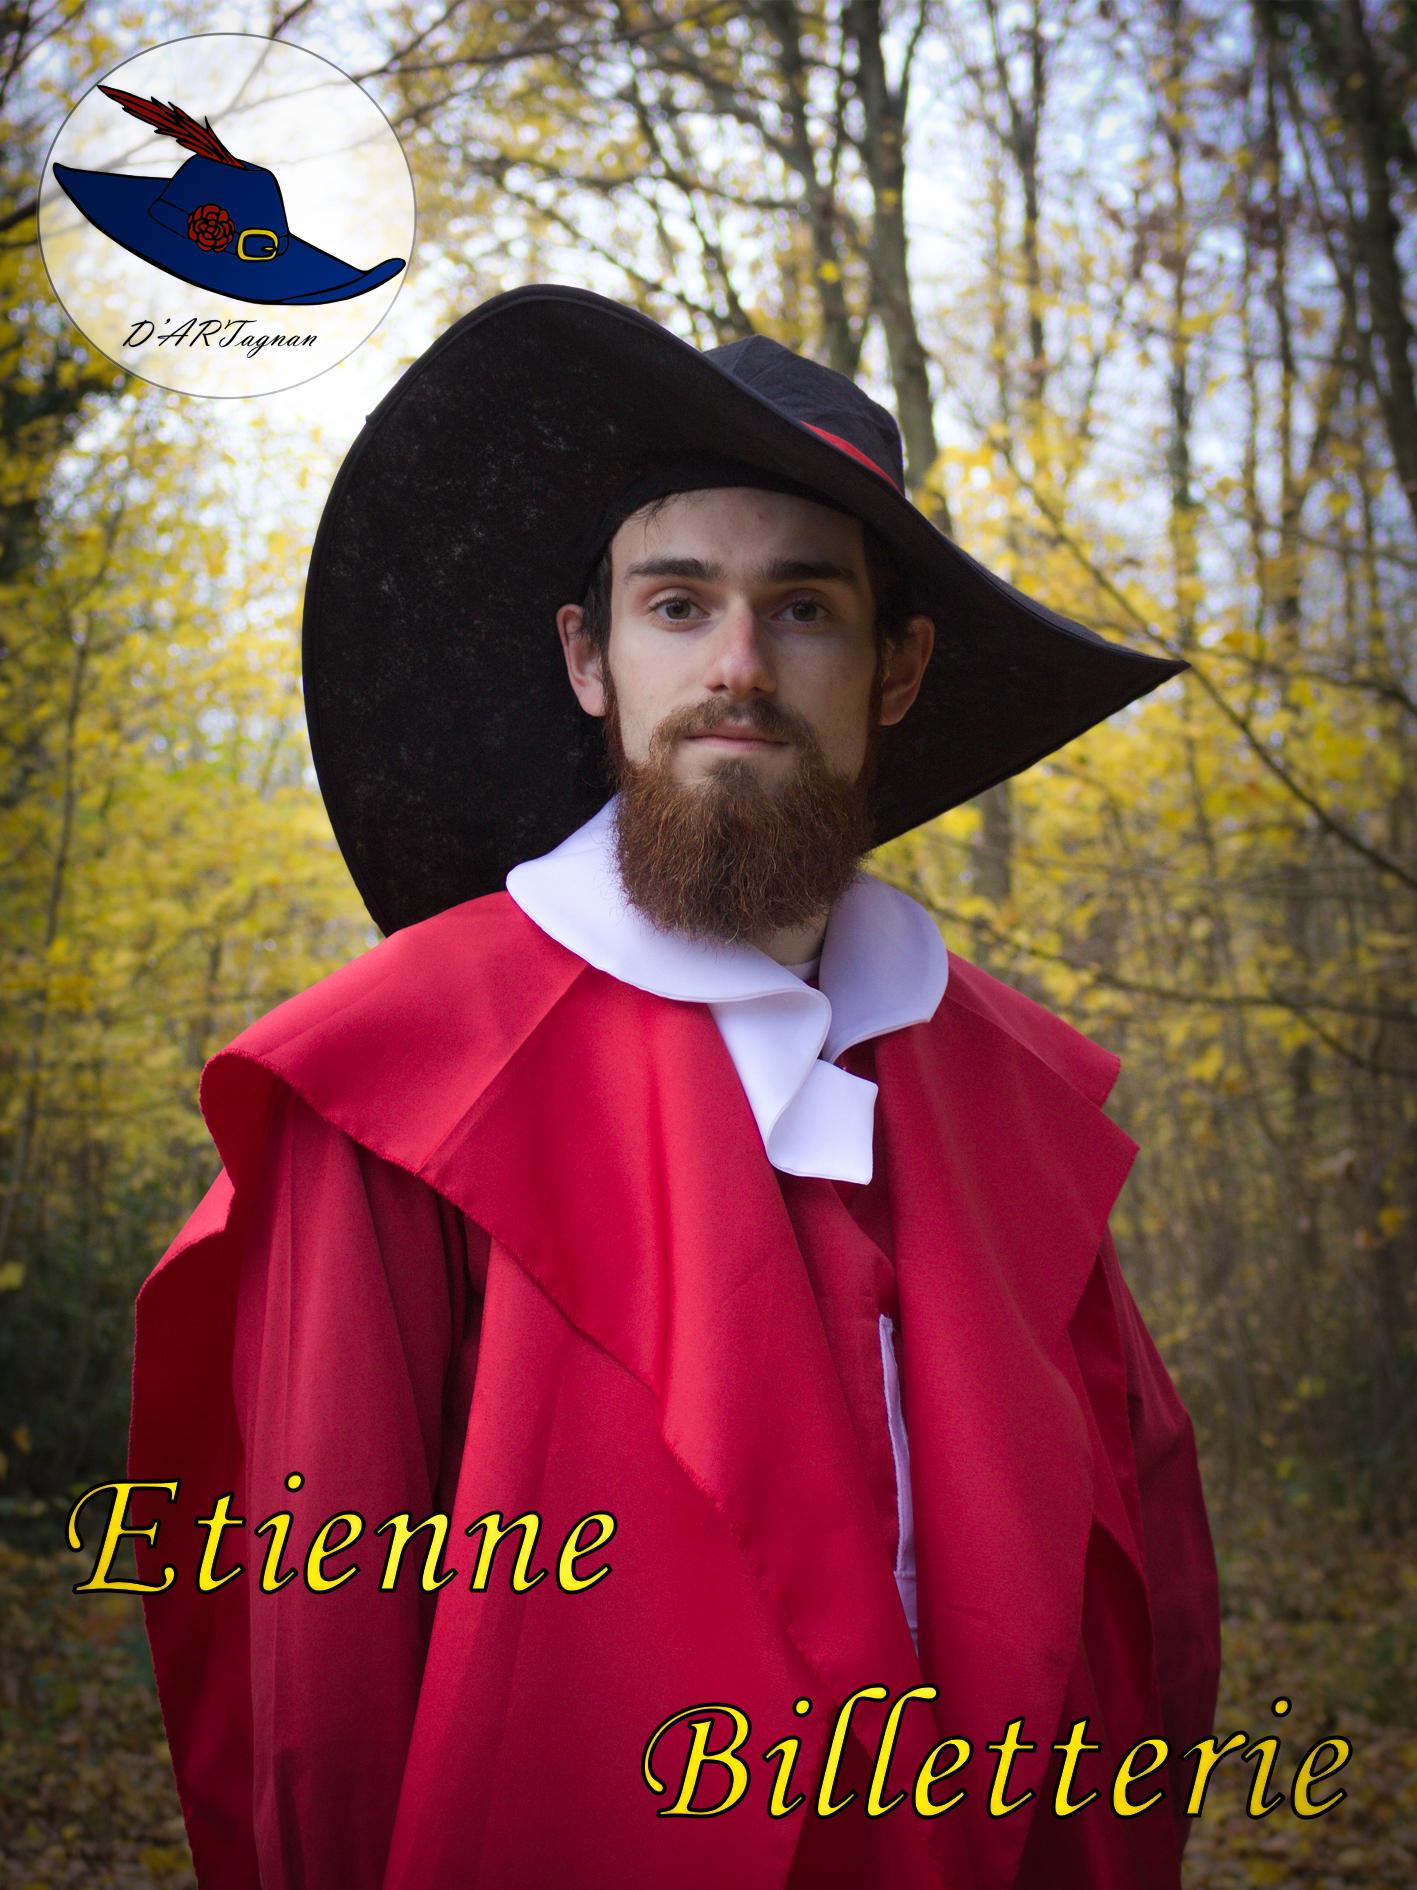 Étienne Bertin